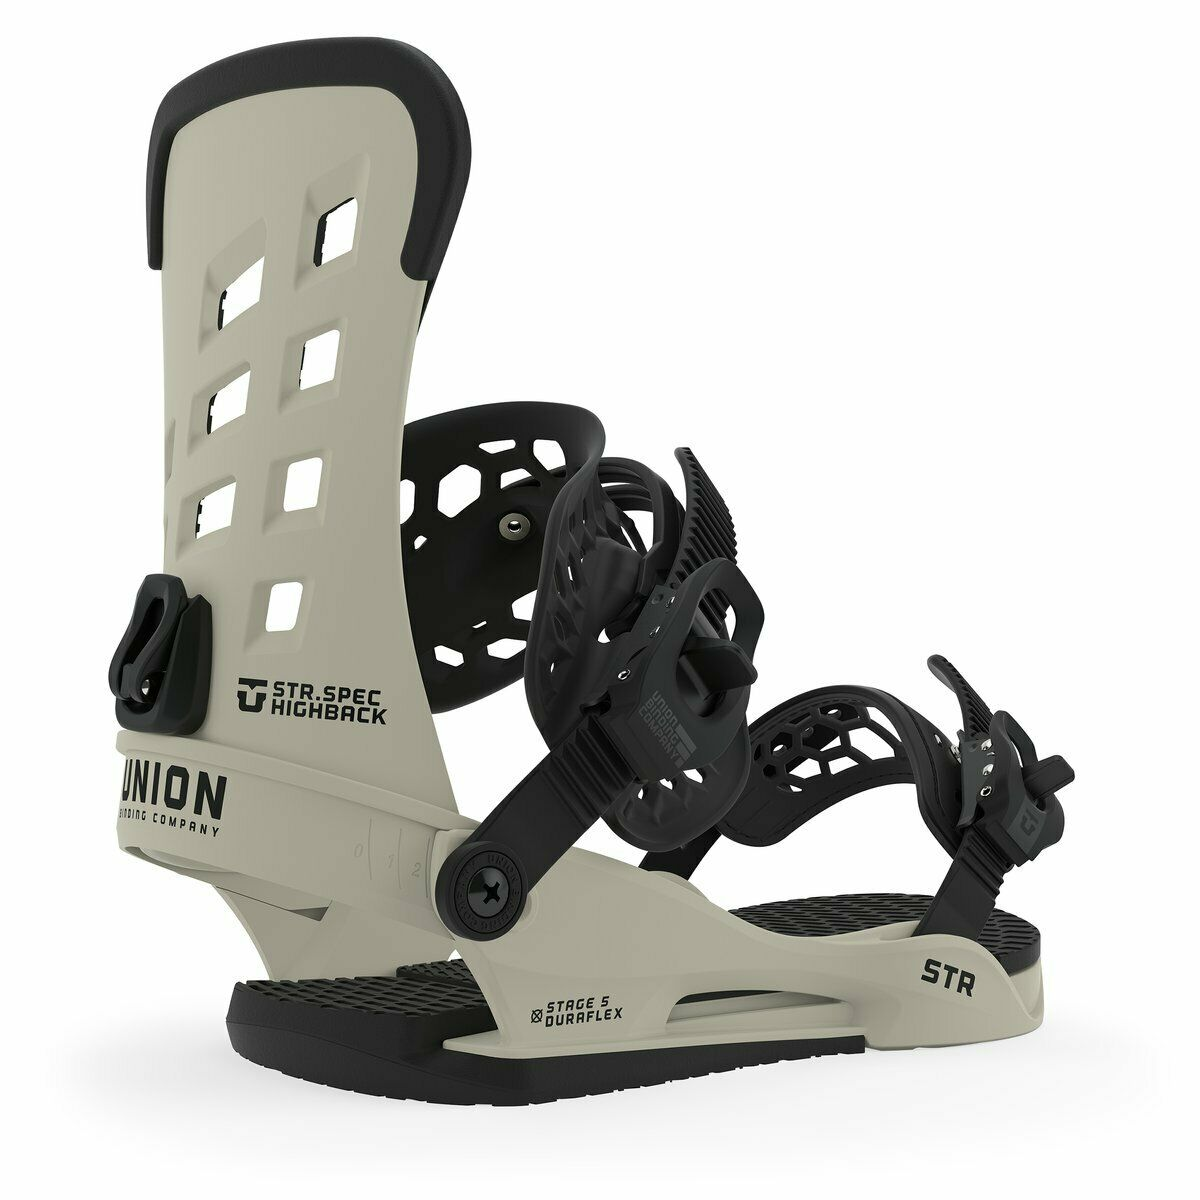 Union - STR   2020 - Mens Snowboard Bindings   Bone